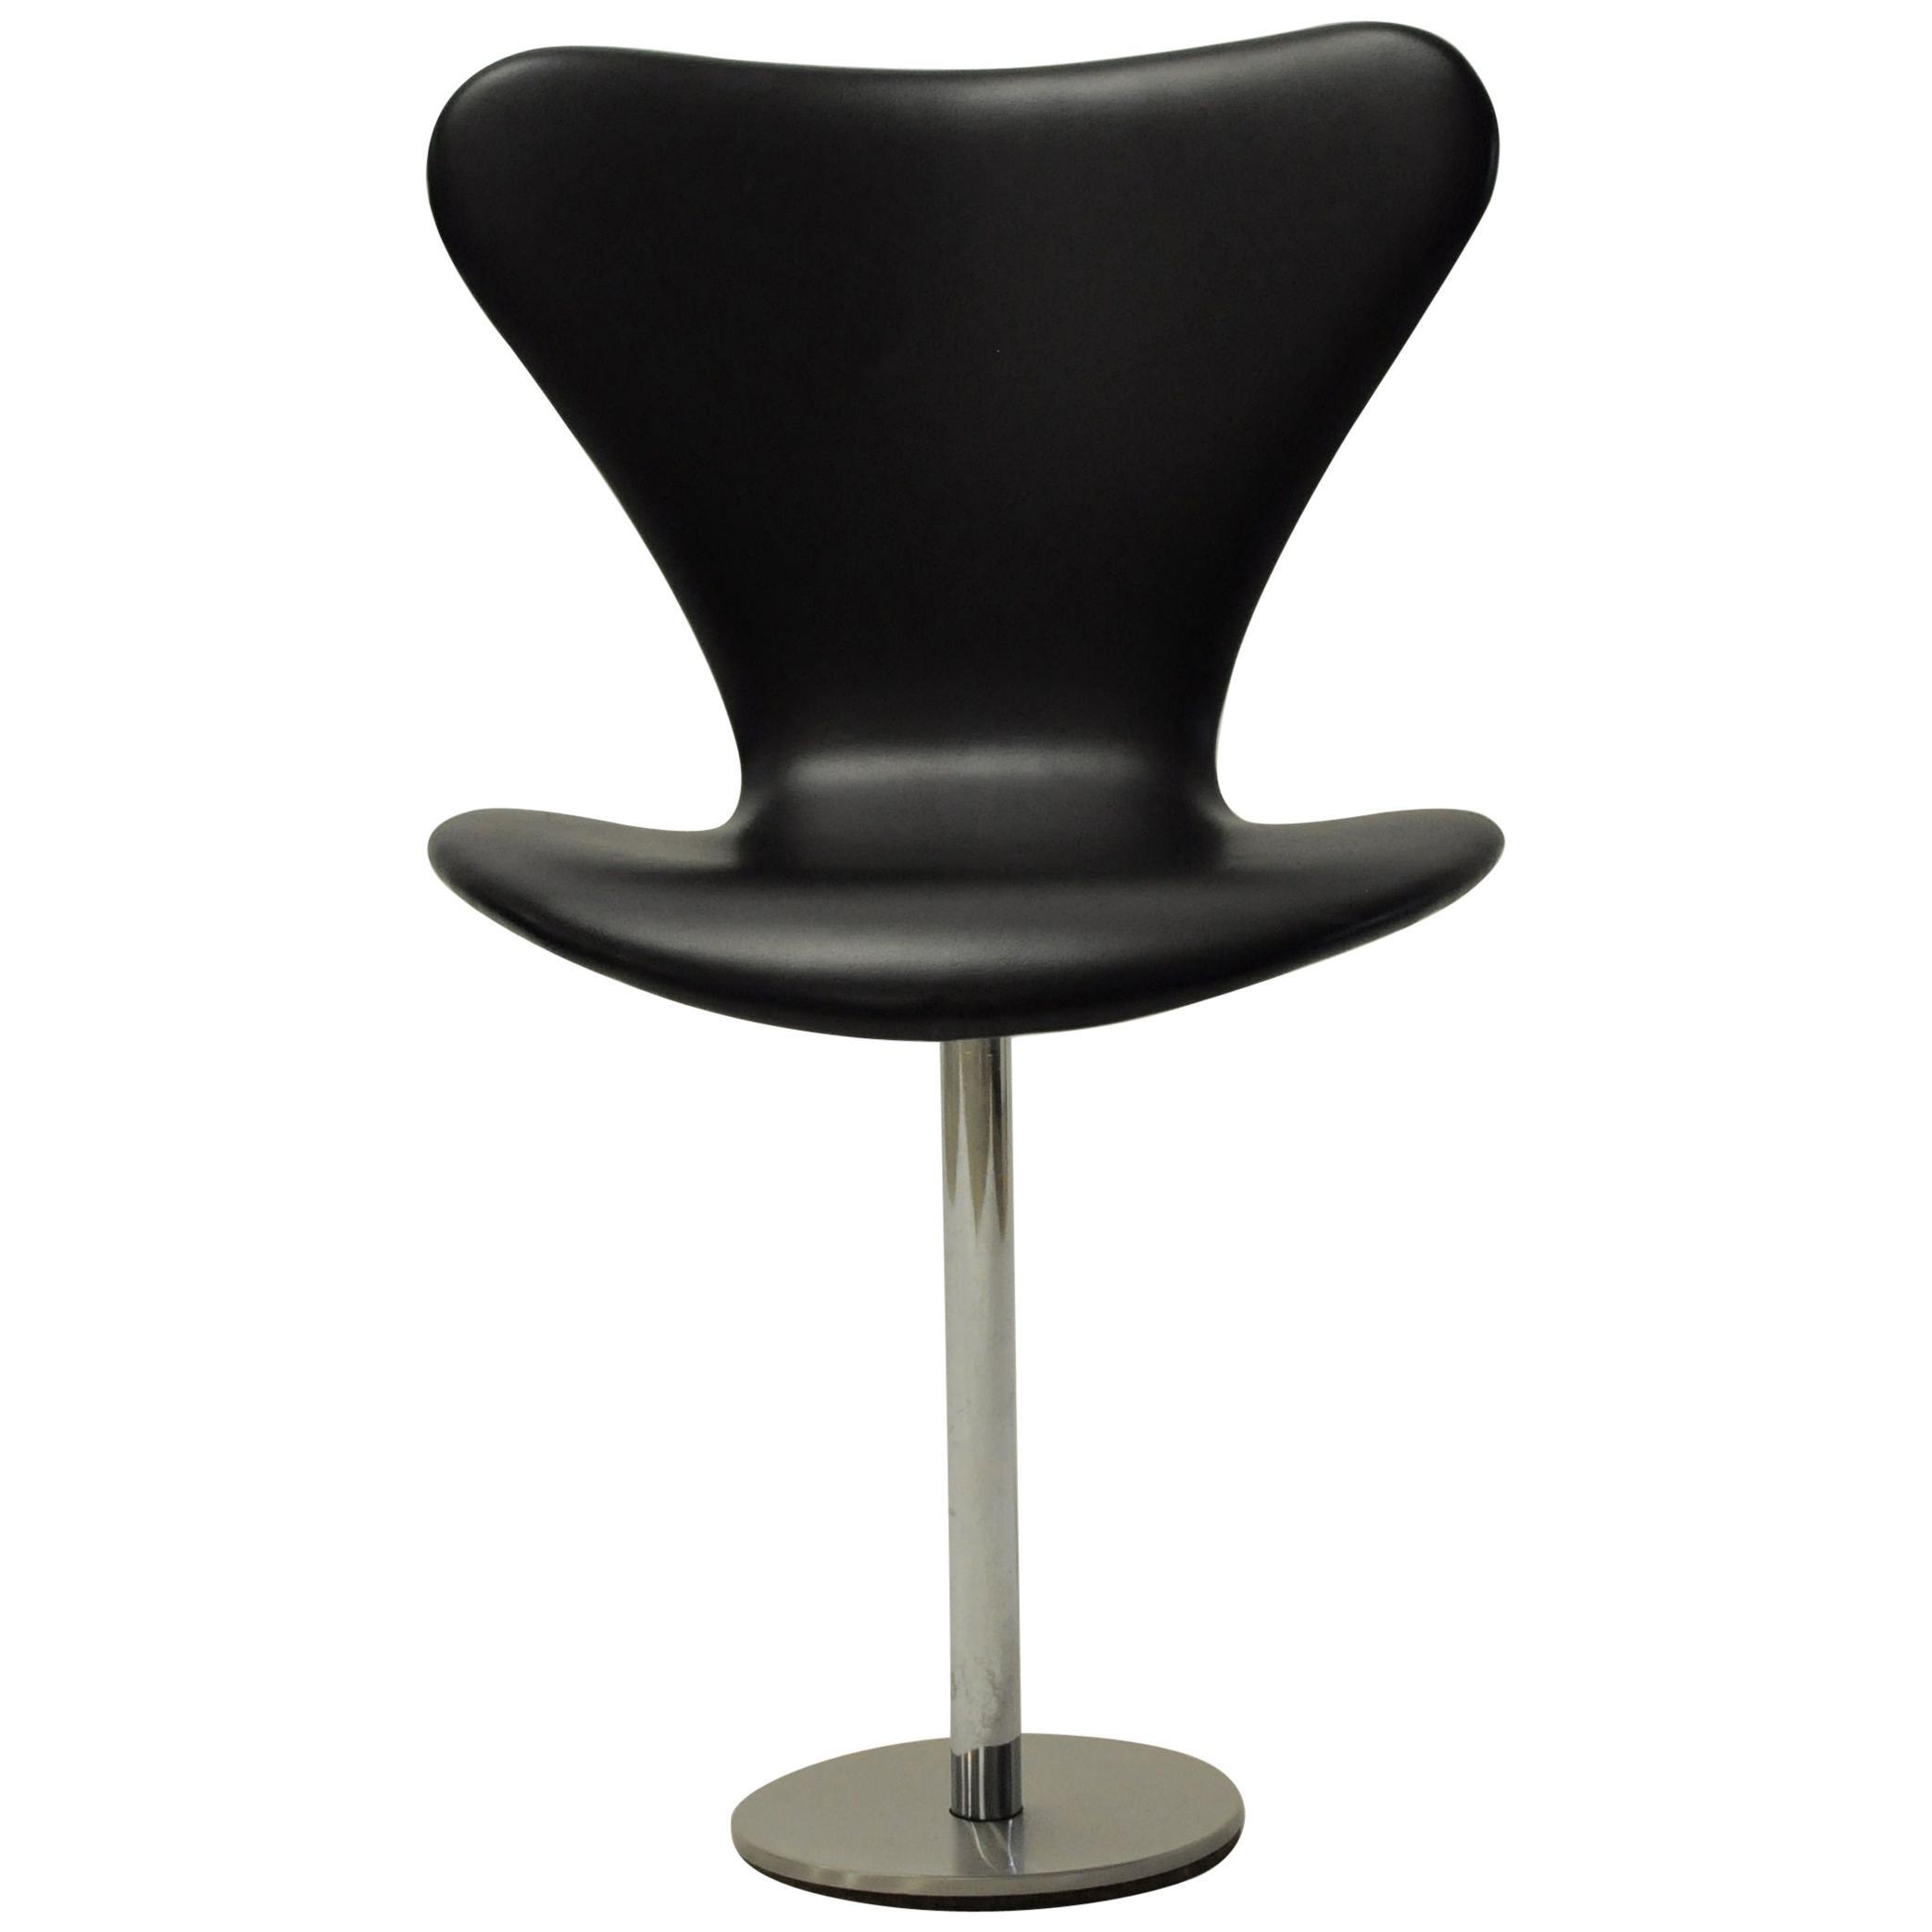 1960s Arne Jacobsen Butterfly Auditorium Chairs By Fritz Hansen